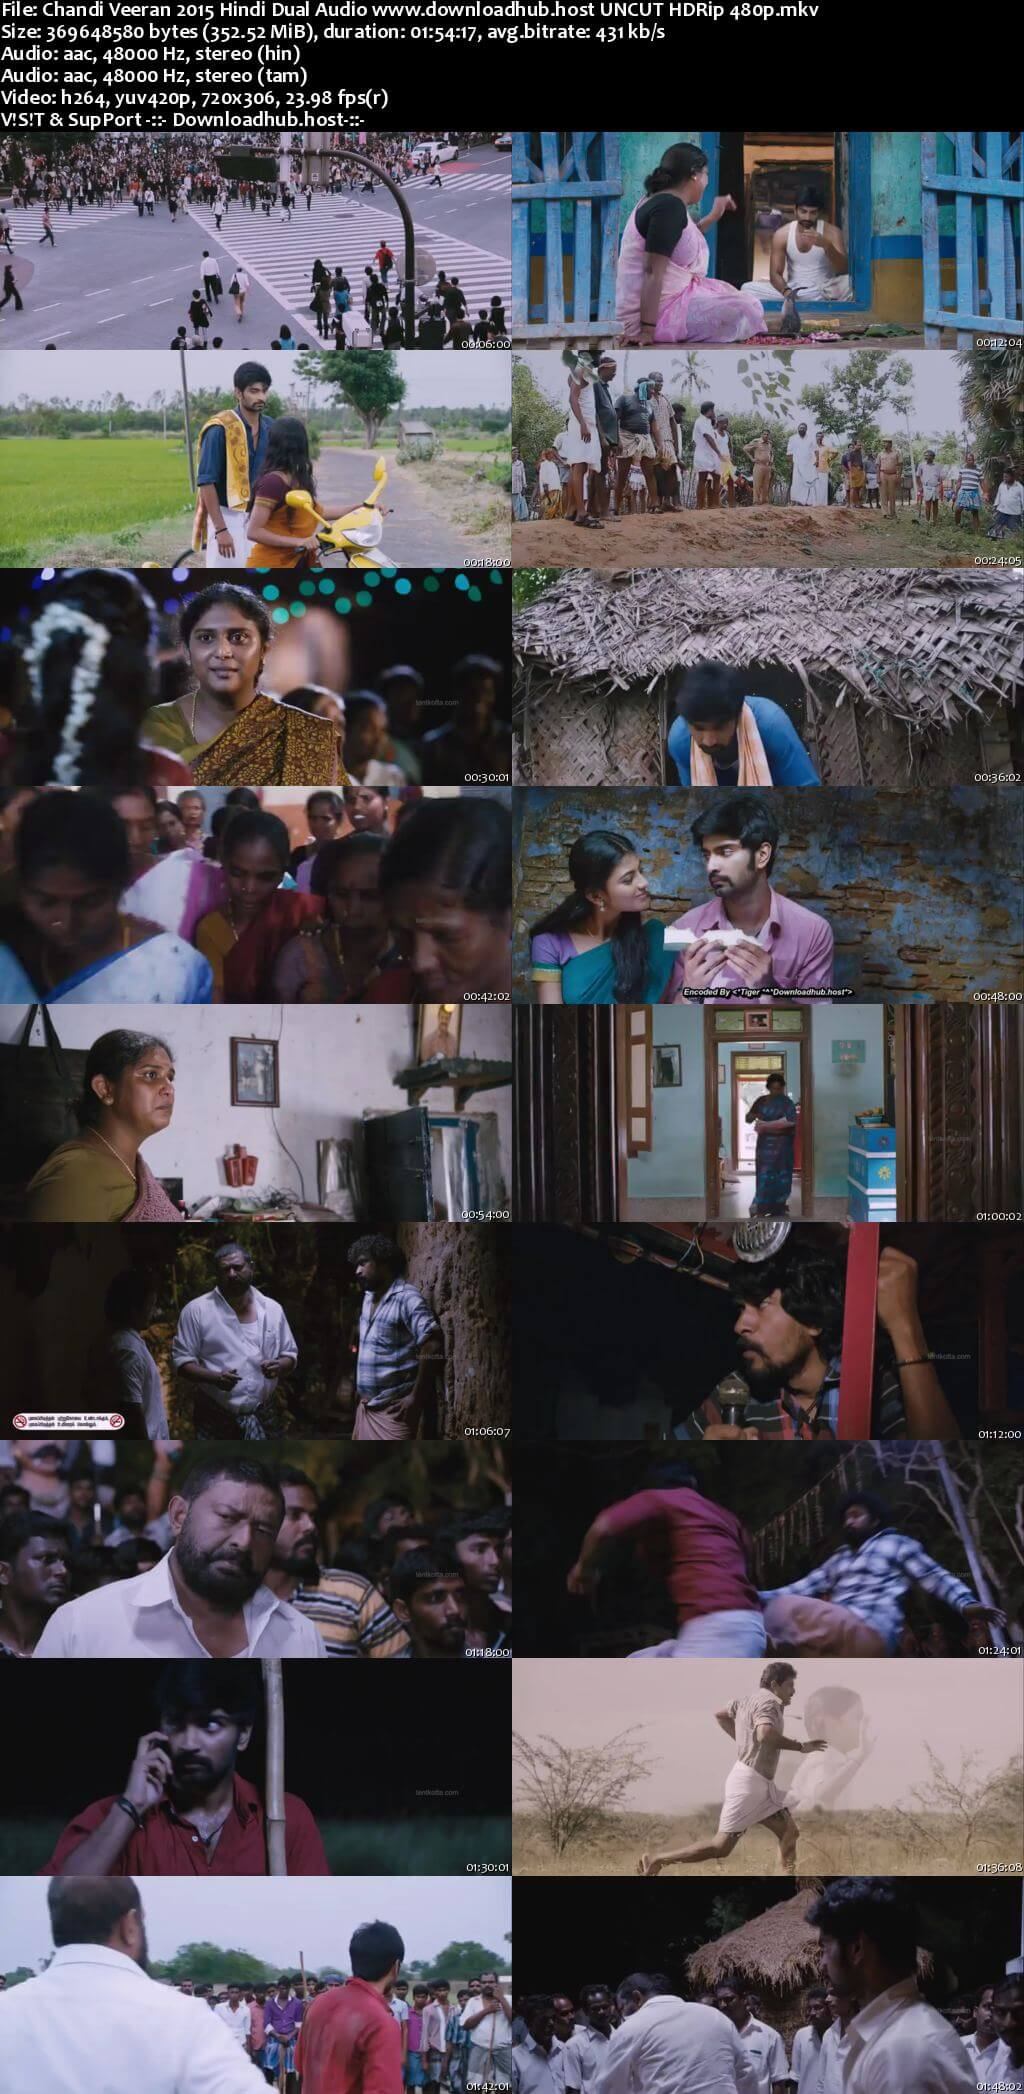 Chandi Veeran 2015 Hindi Dual Audio 350MB UNCUT HDRip 480p